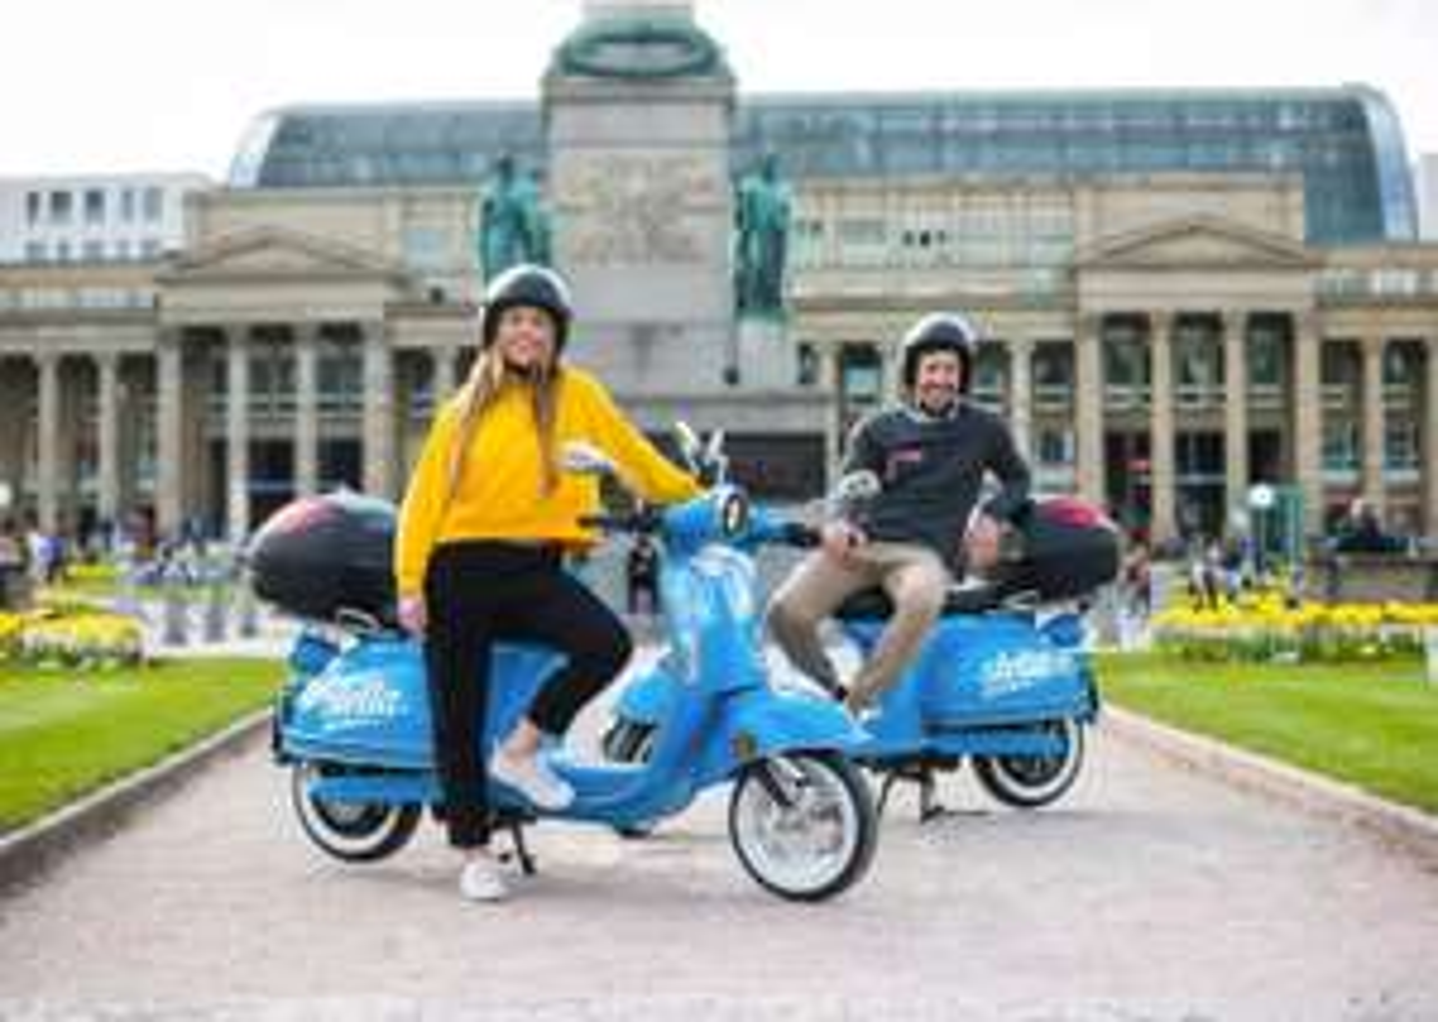 [lokal Stuttgart] stella E-Roller Sharing kostenlose Registrierung +15 min